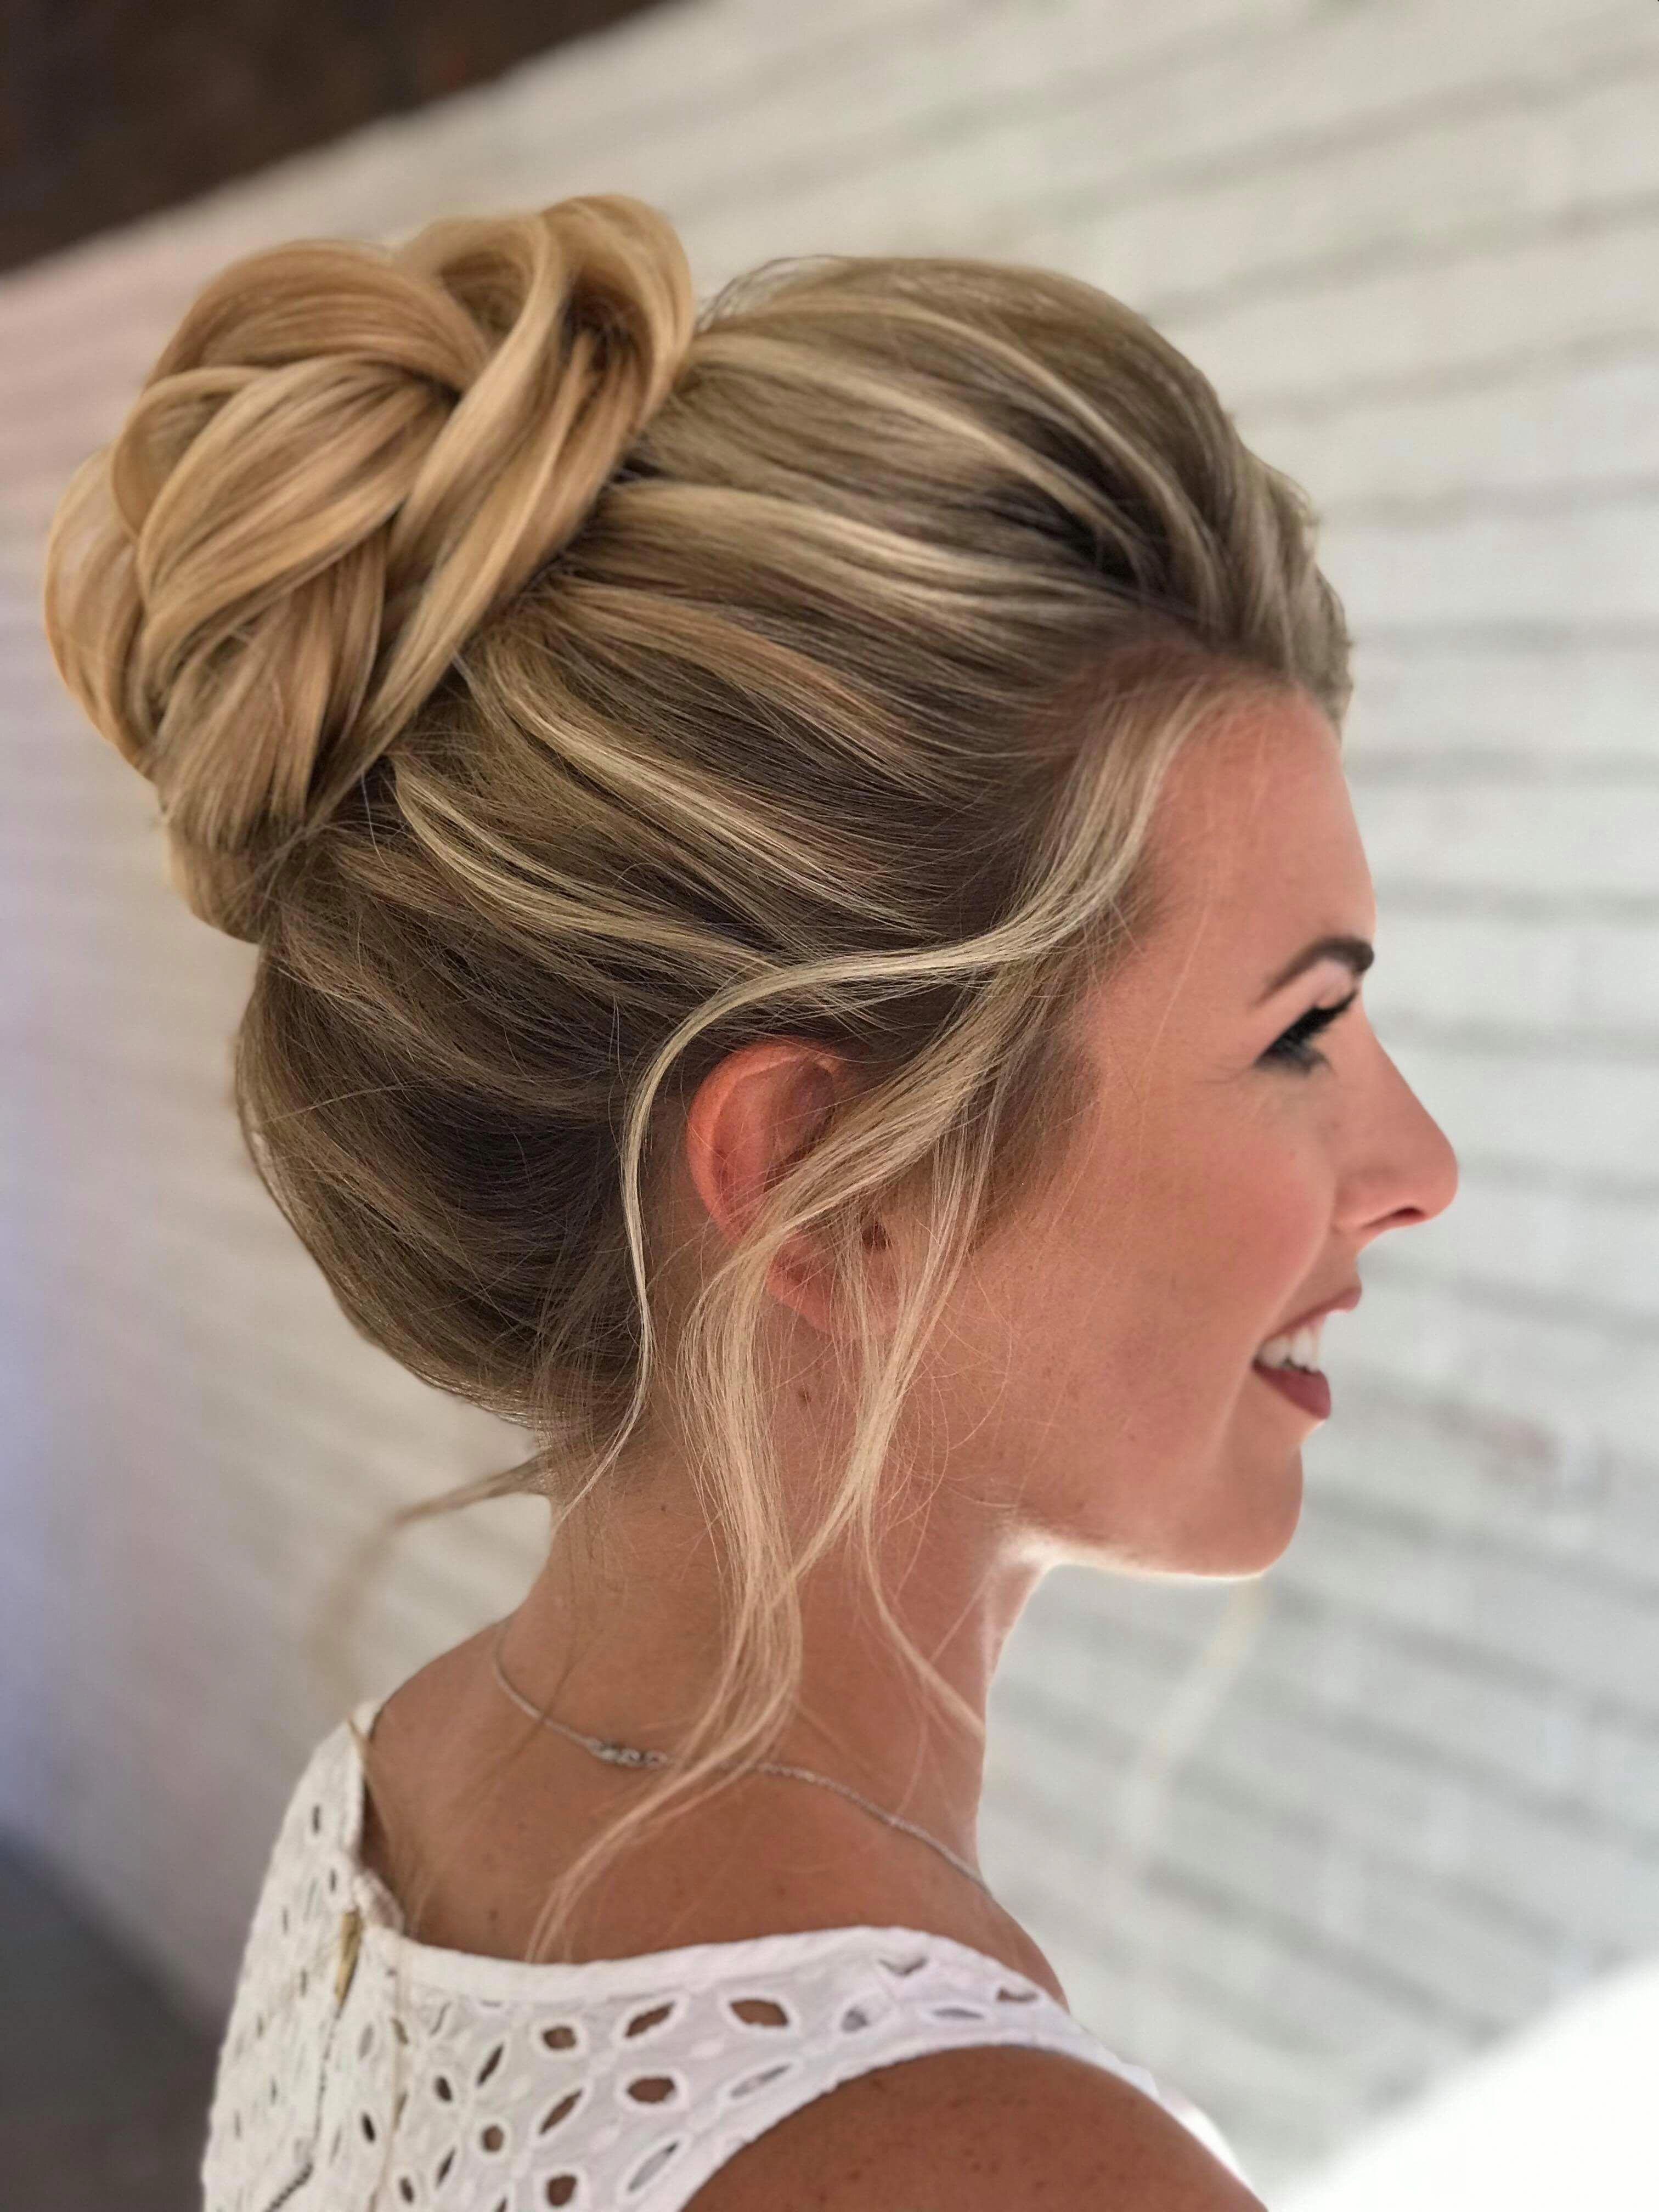 wedding hairstyle high bun on highlighted blonde hair